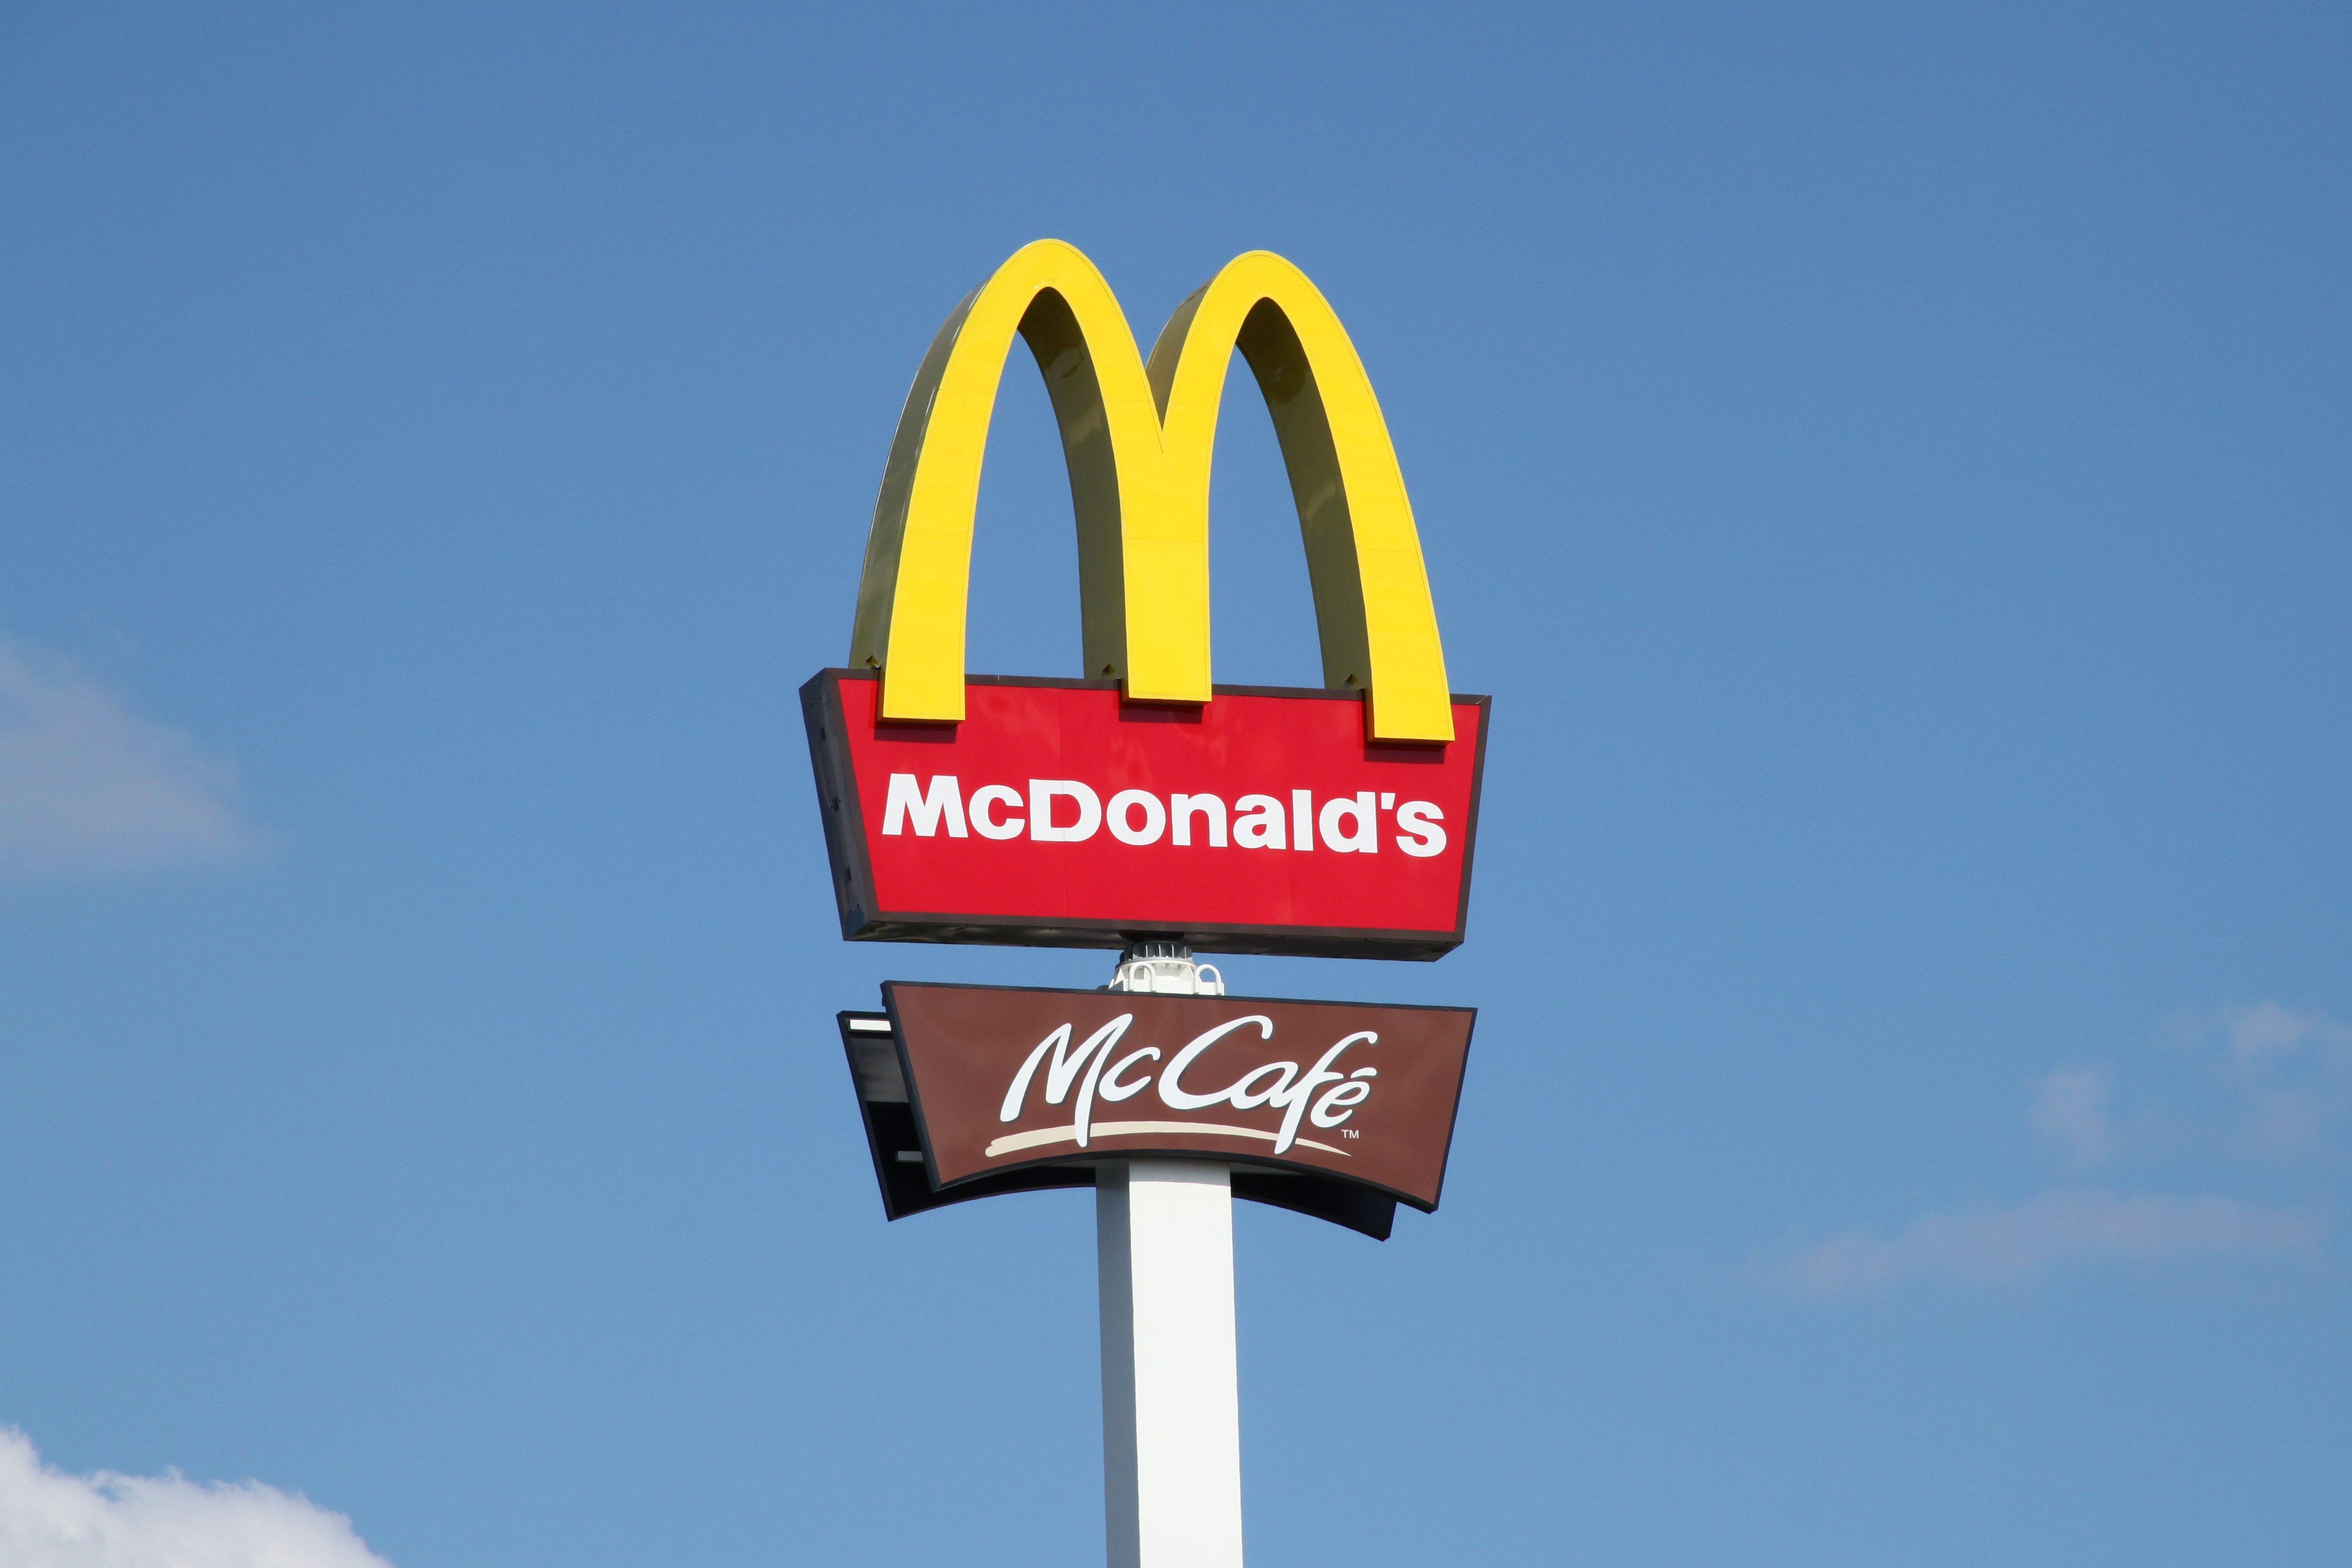 M Letter Logo Wallpaper Hd Who Should McDonalds B...